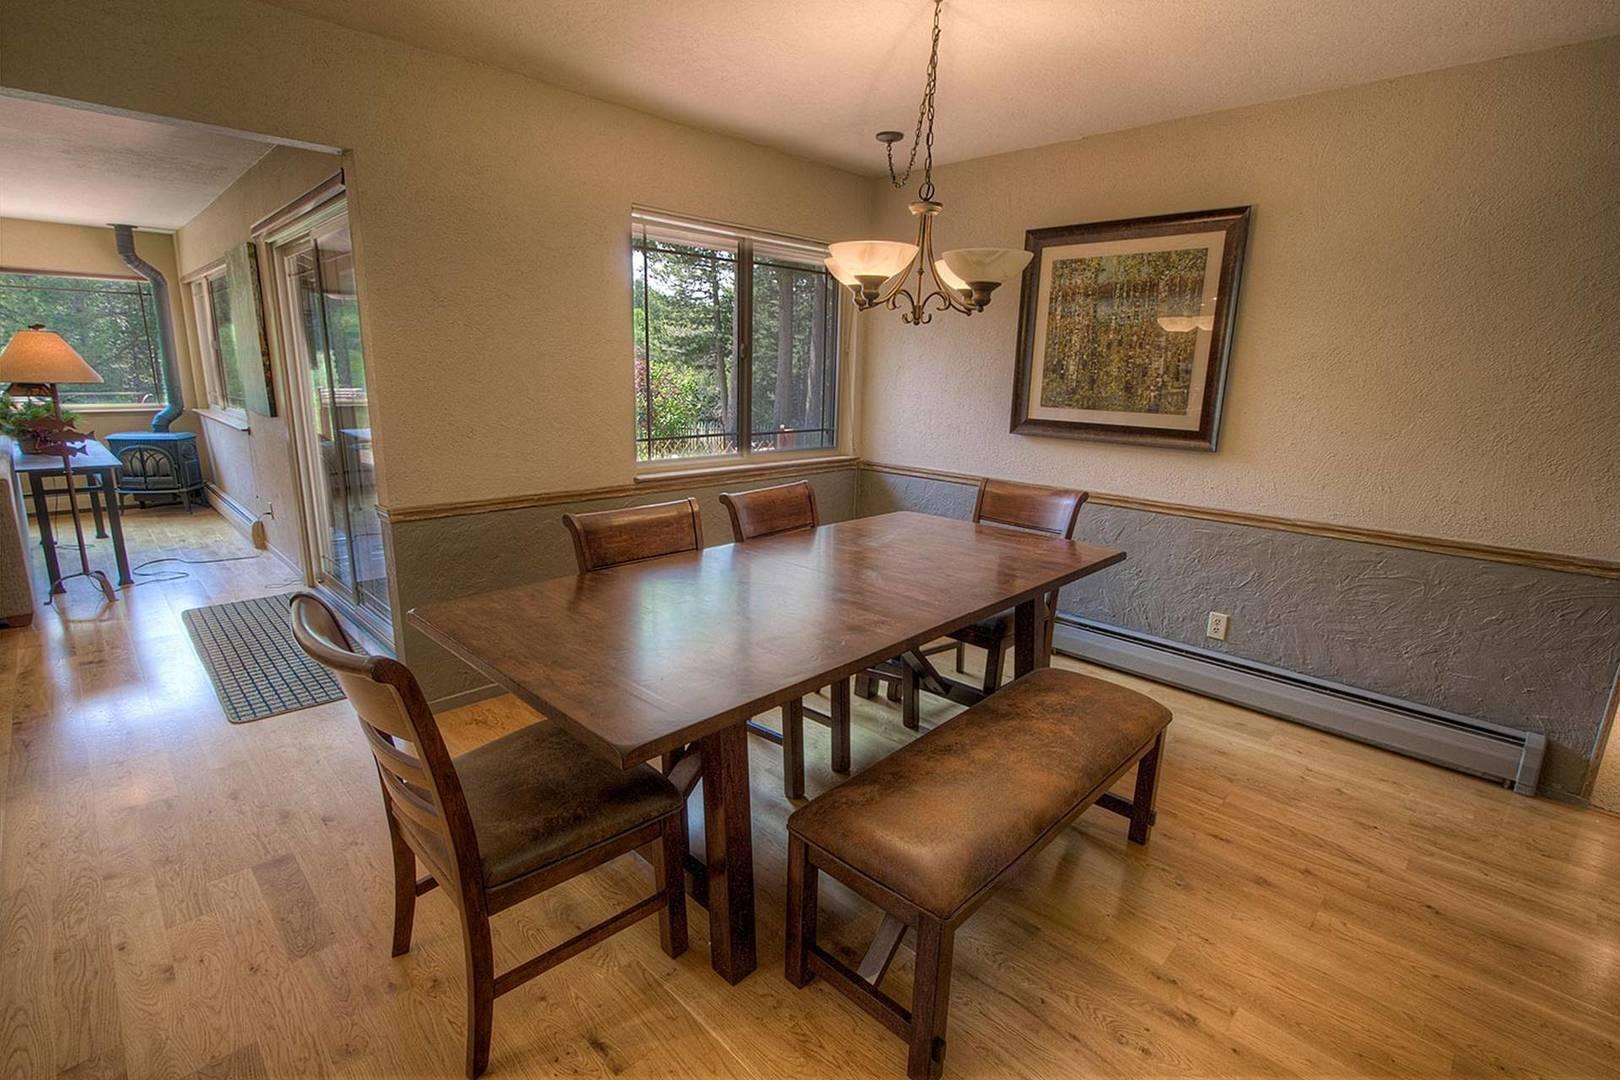 cyh1282 dining room